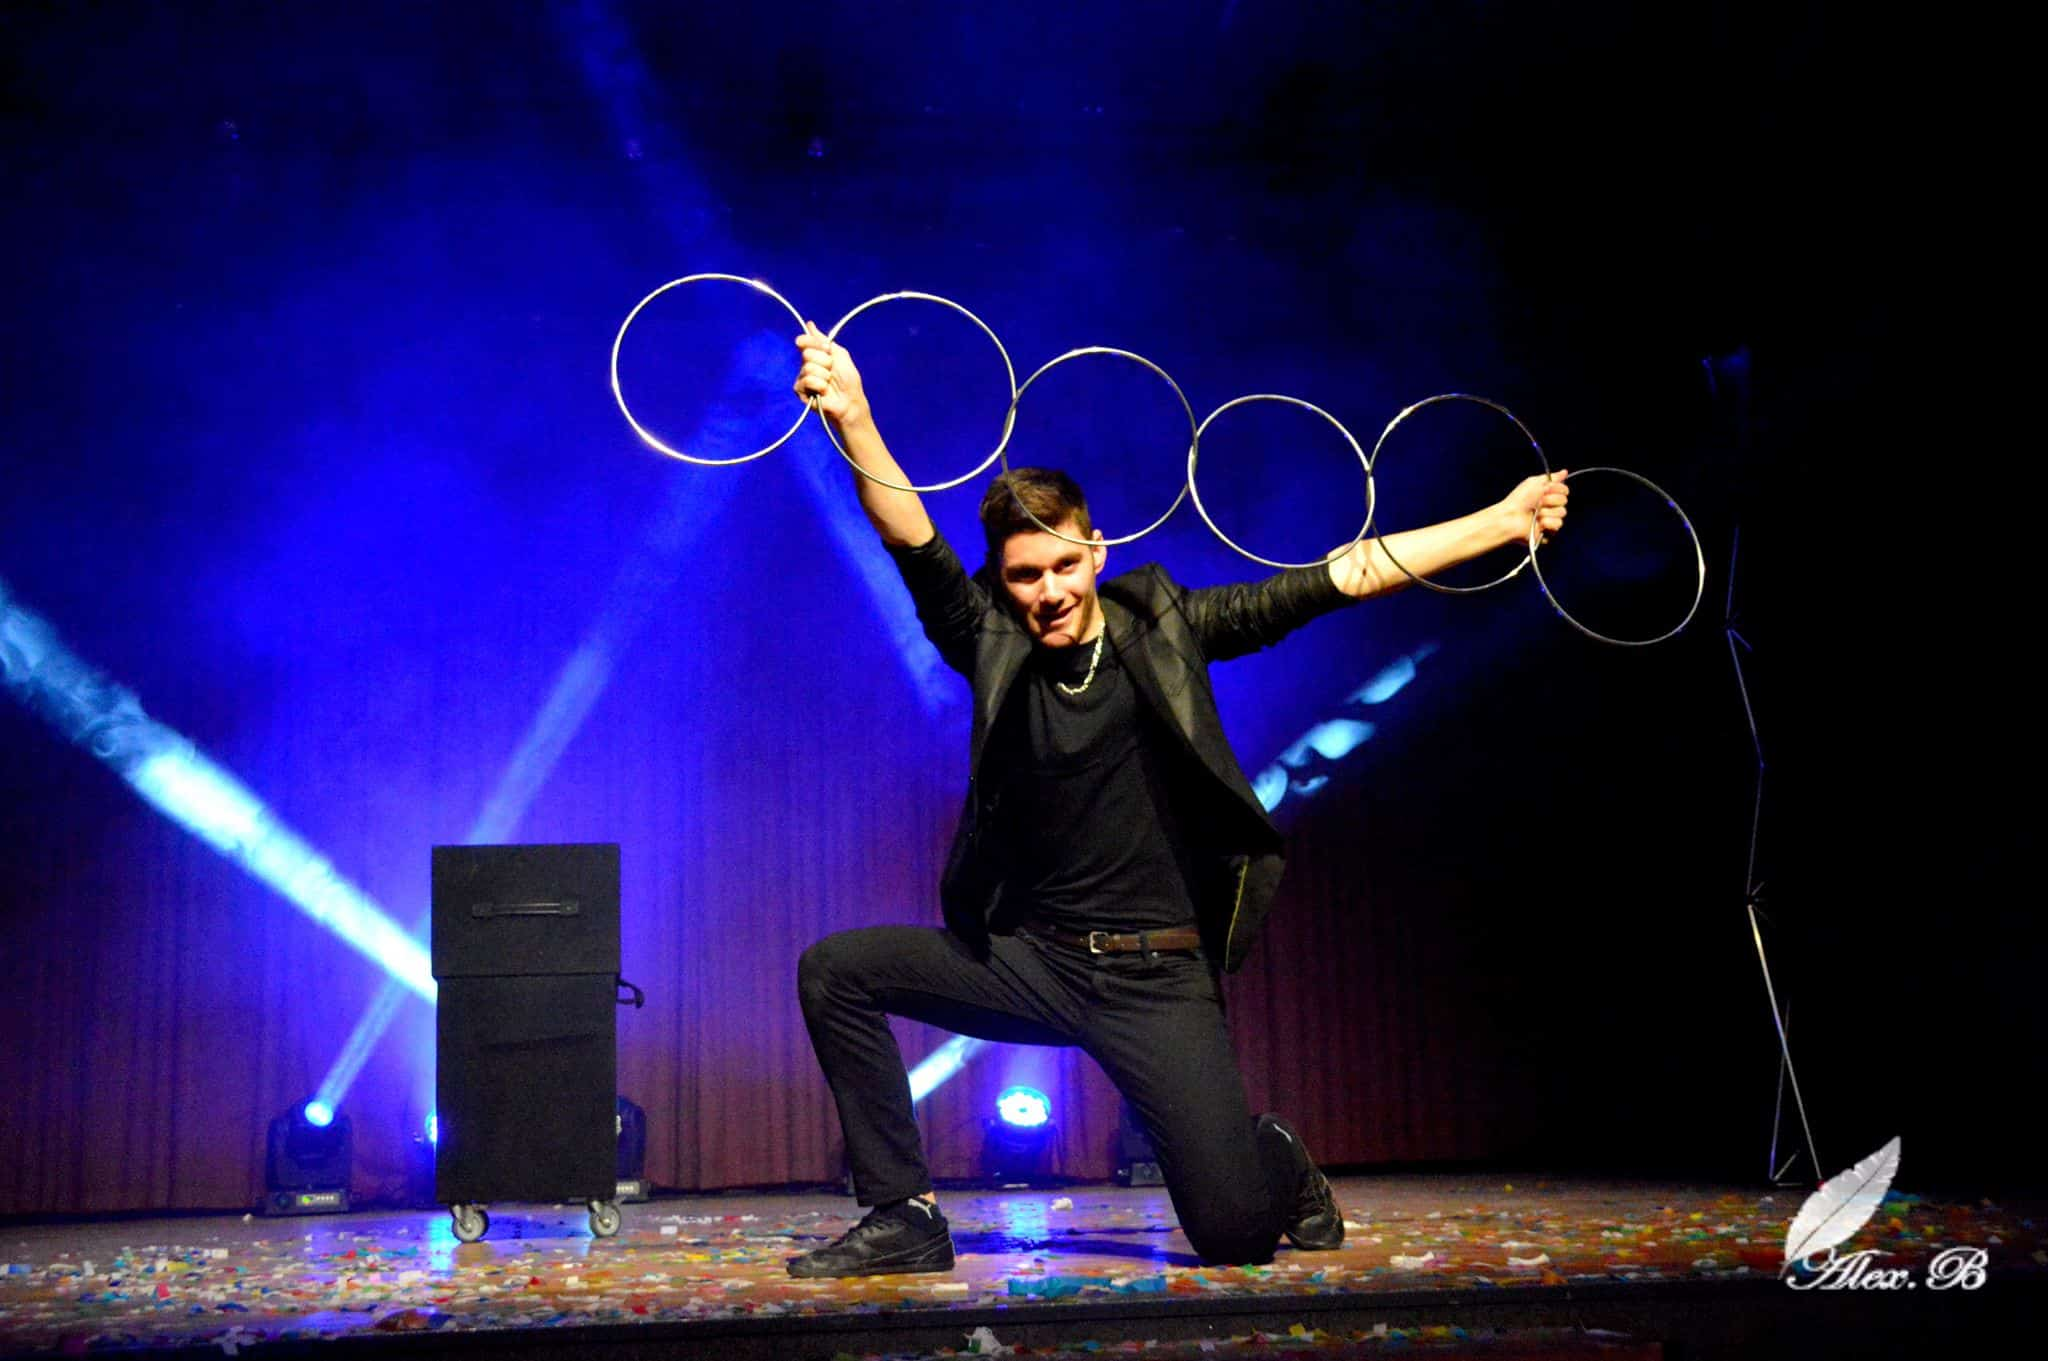 magicien anneaux chinois orleans spectacle